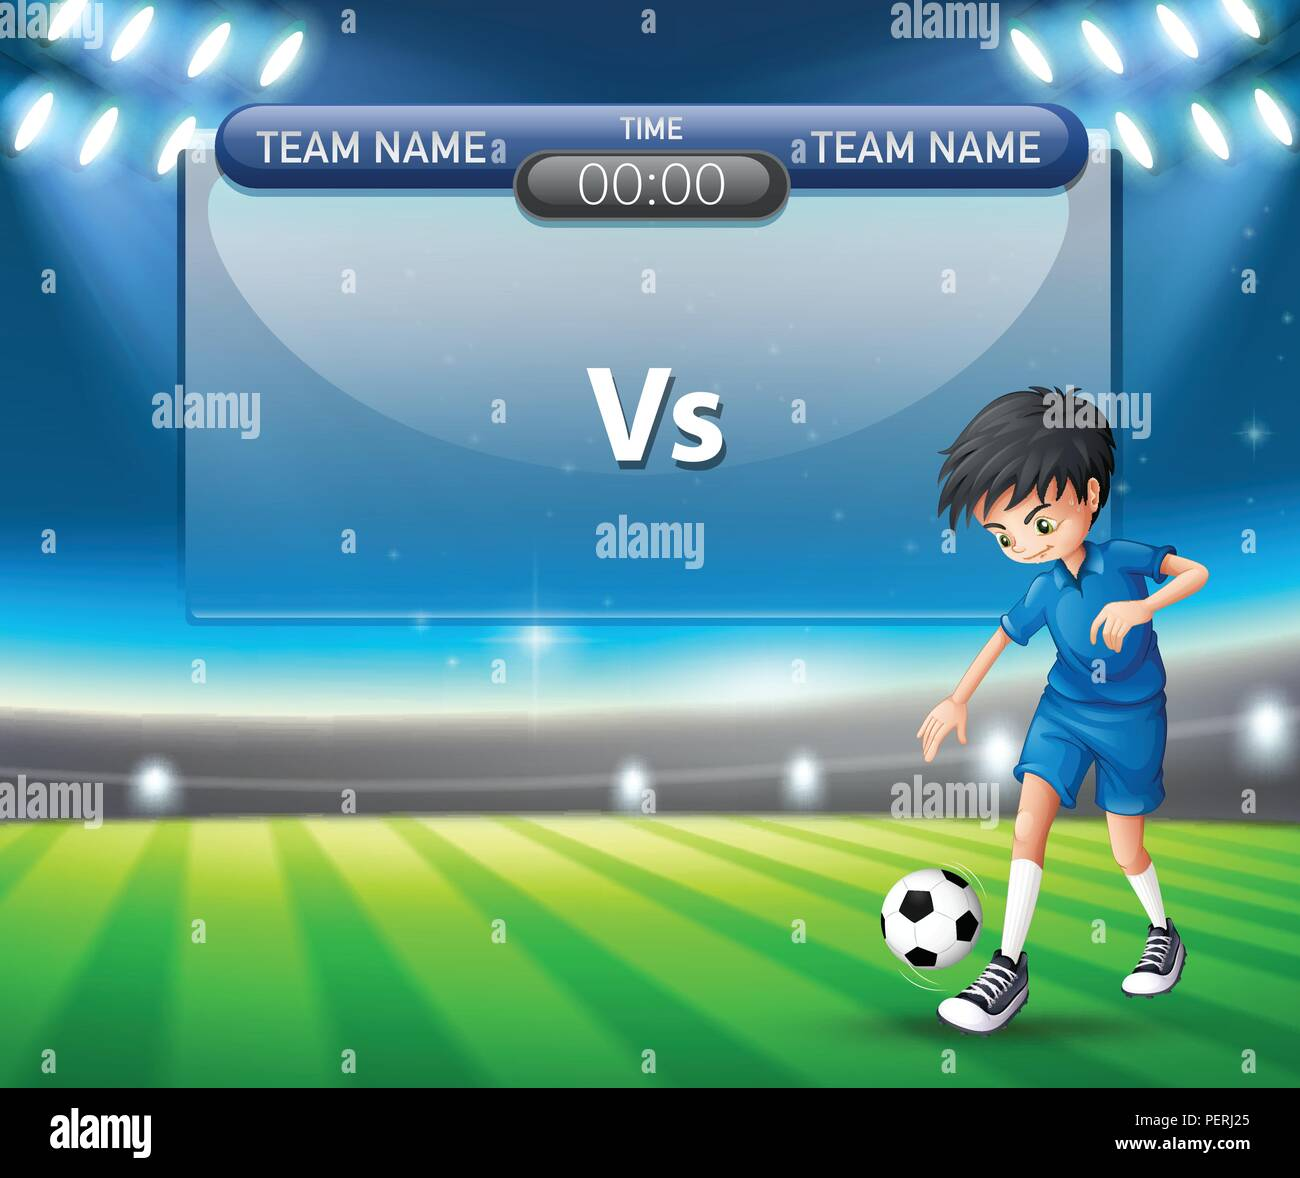 a football player scoreboard template illustration stock vector art